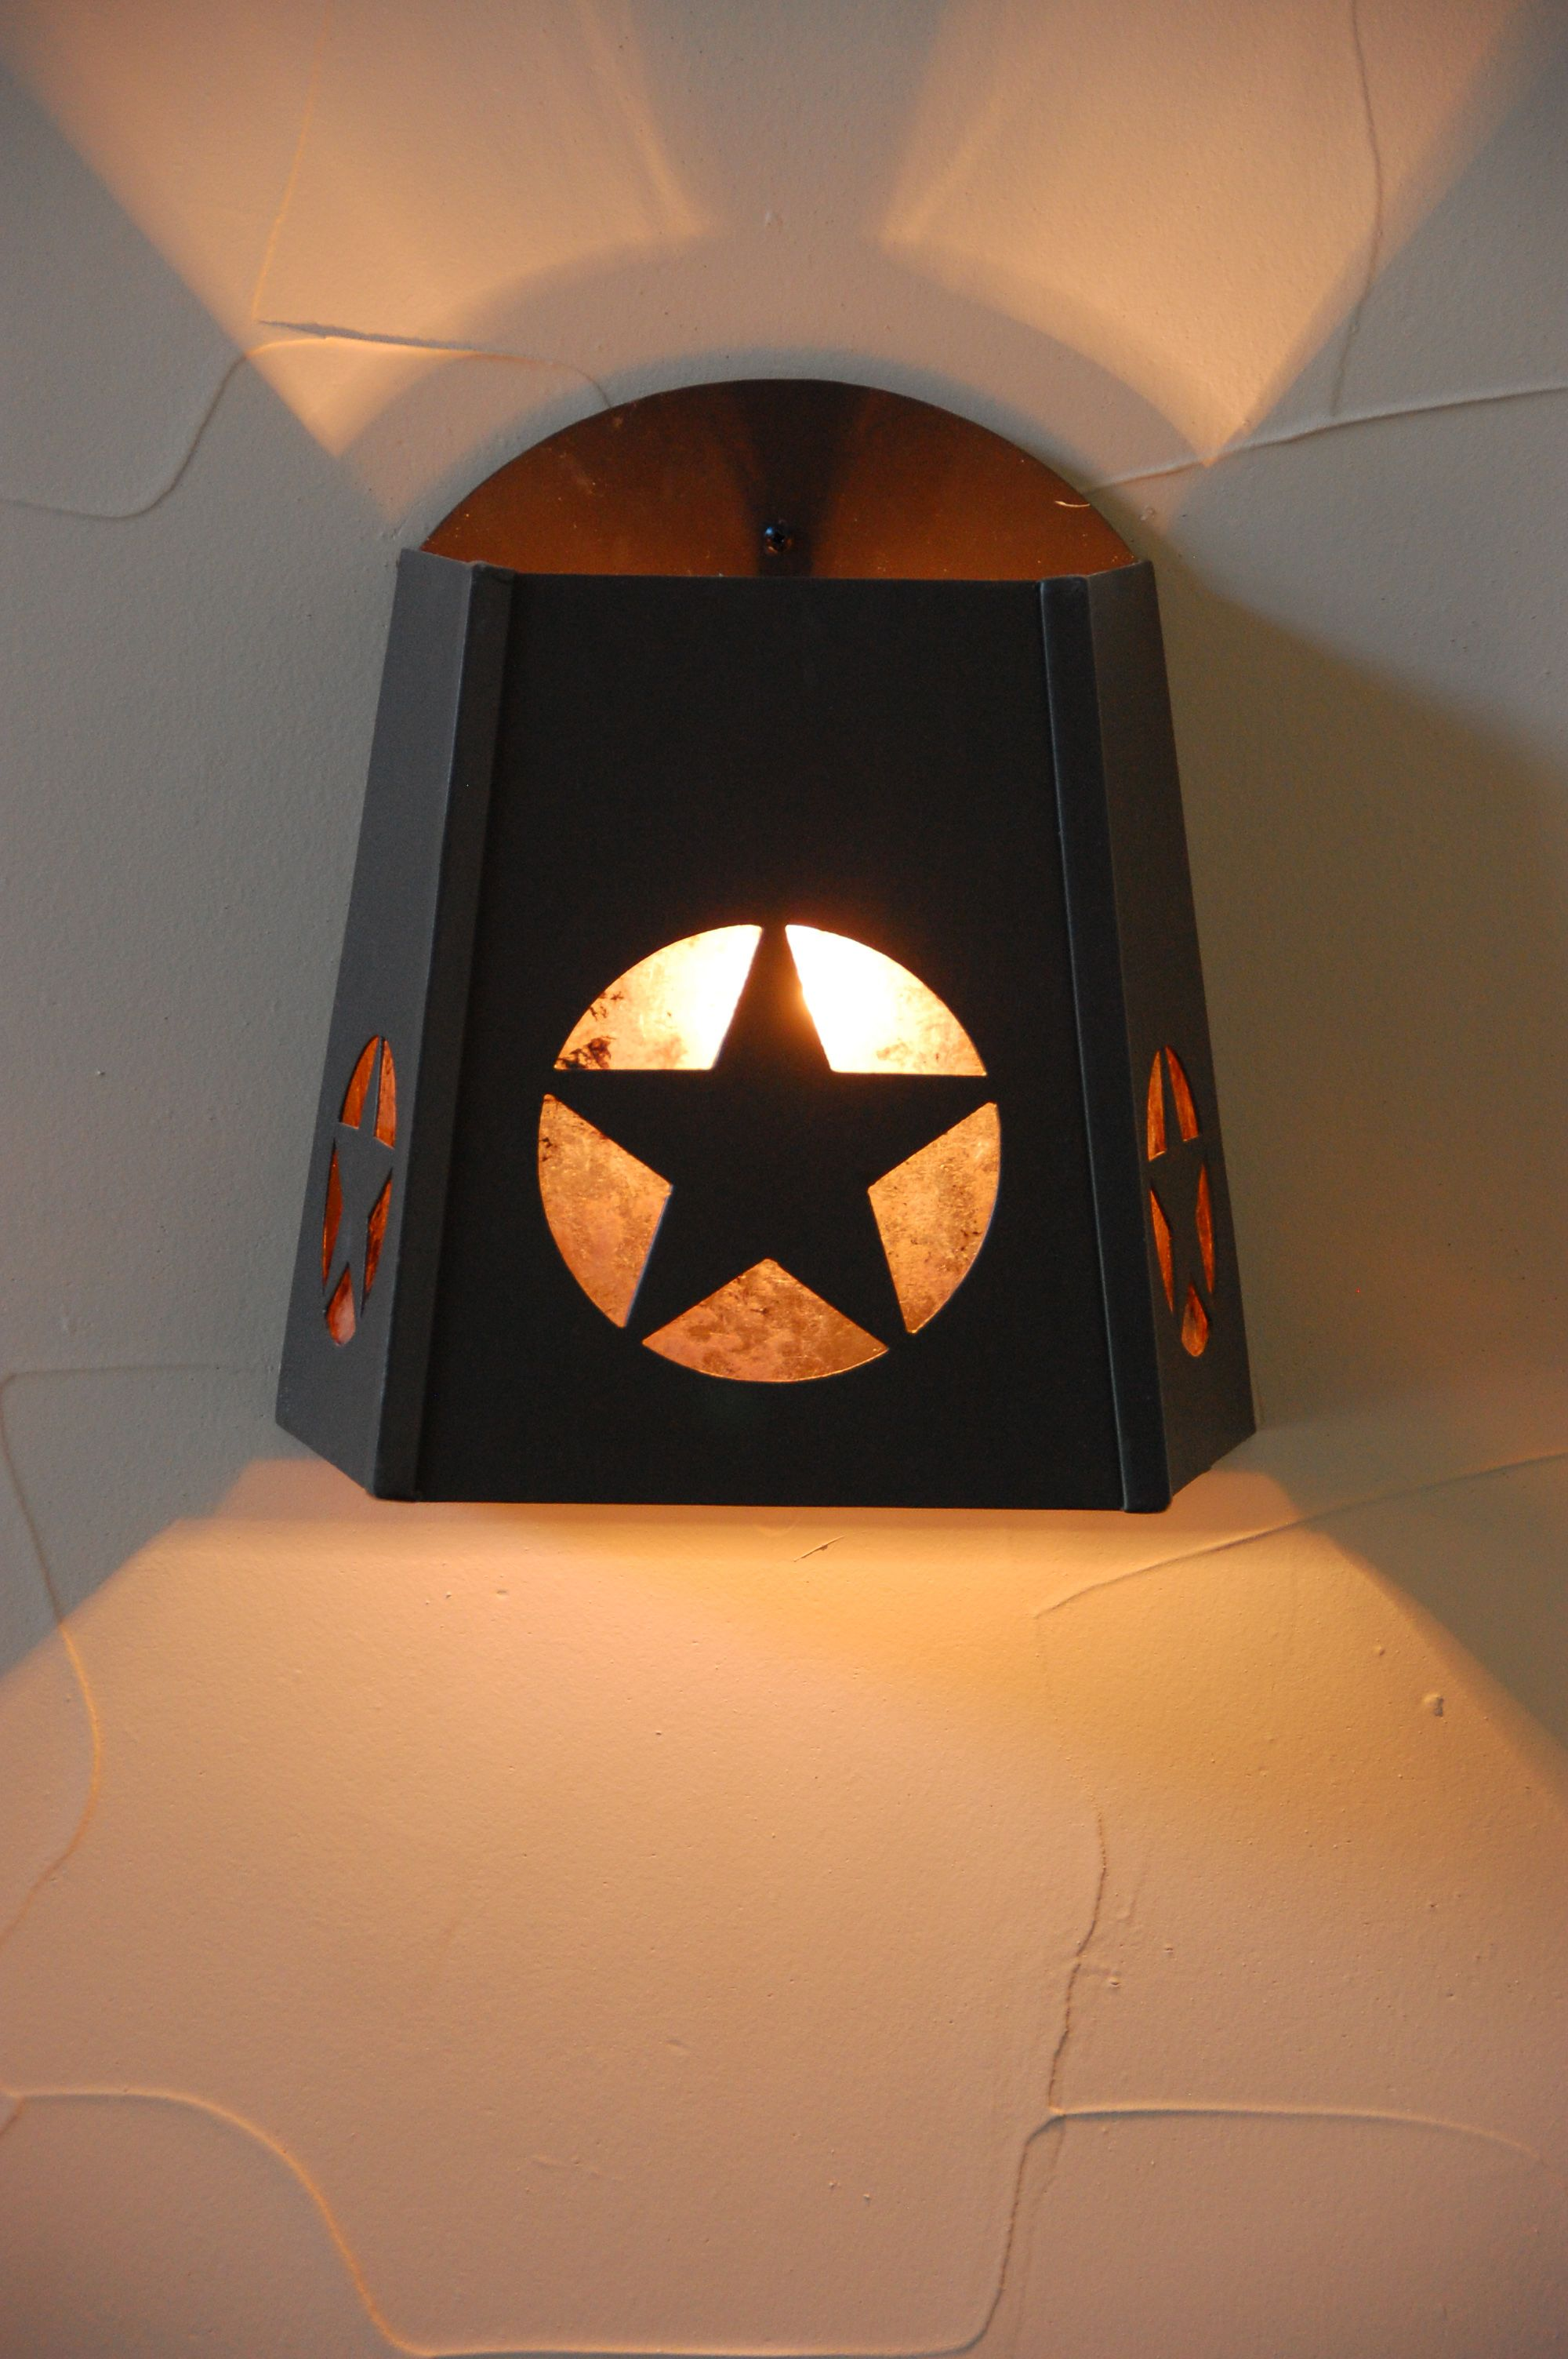 lighting tulum shades shade universal design and fan co fabric smsender ceiling light decor